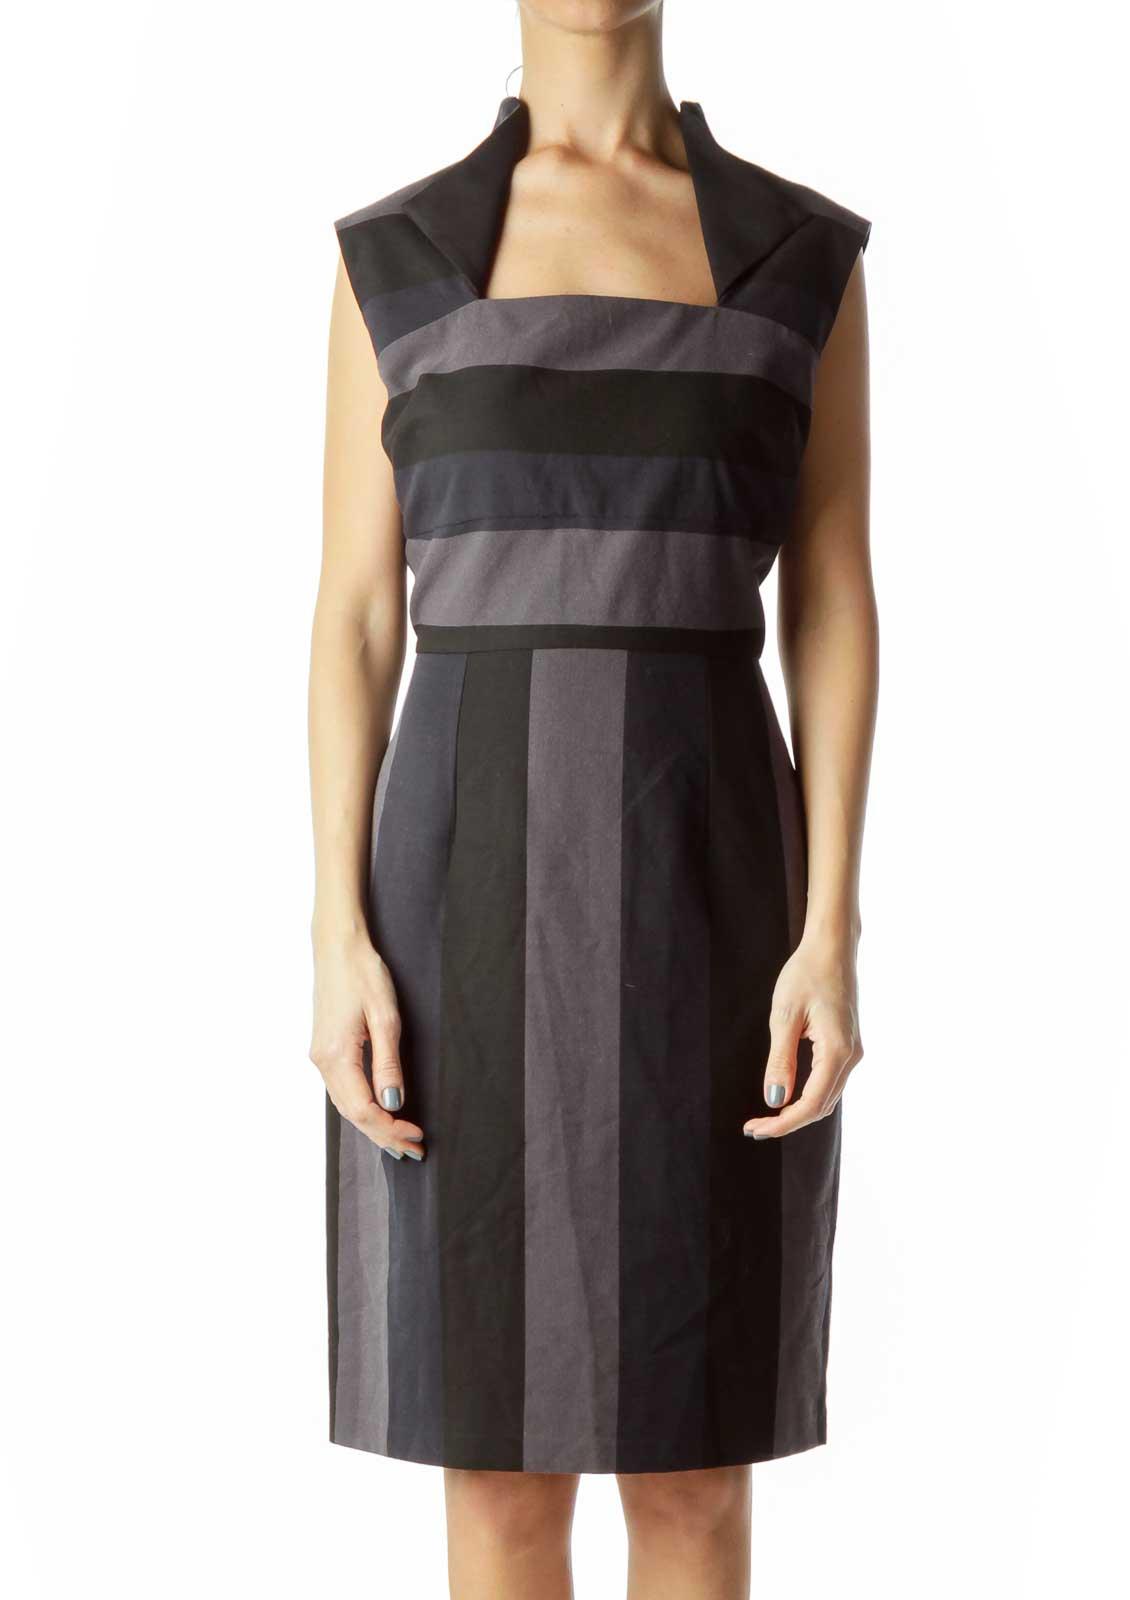 Black Navy Gray Striped Sheath Dress with Collar